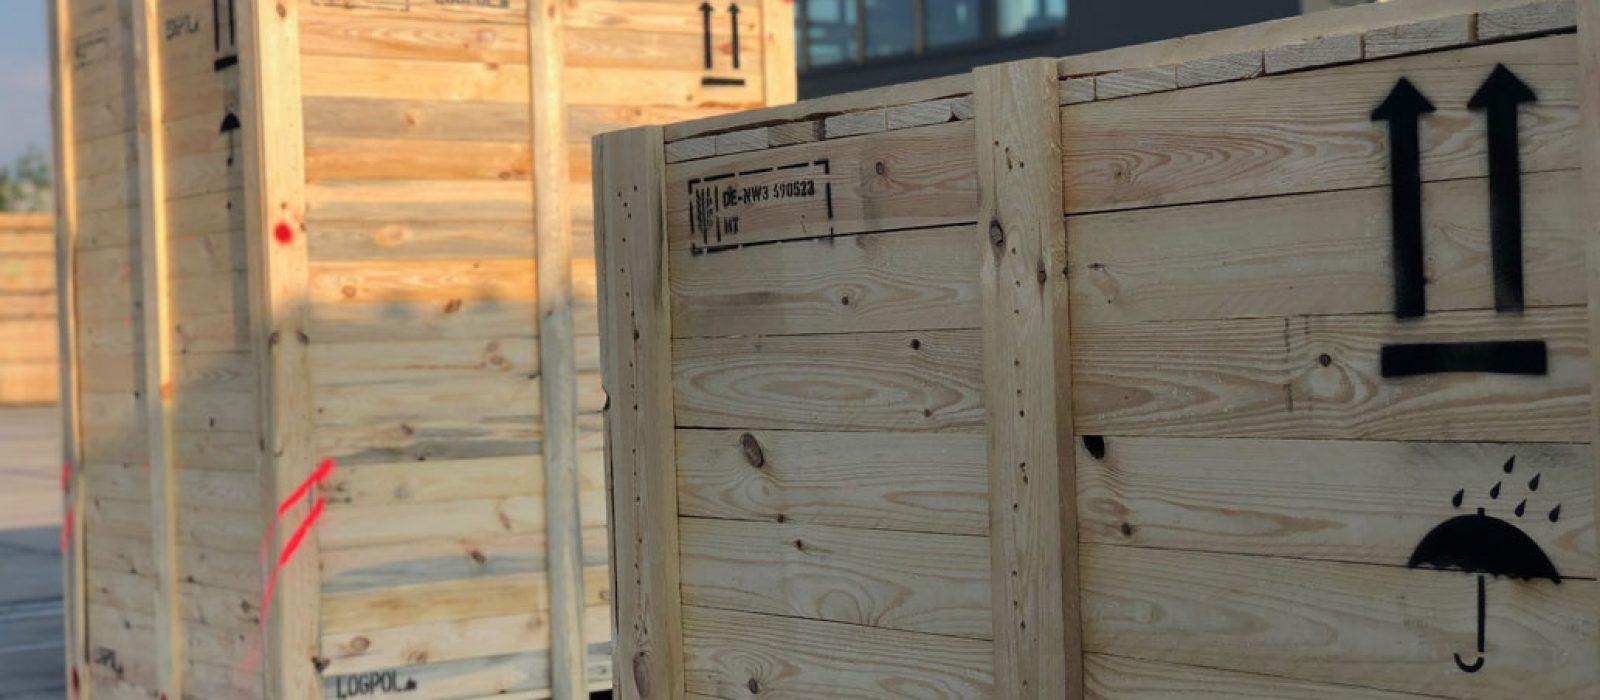 Holzkiste-1500x1400x1100-mm-LOGPOL